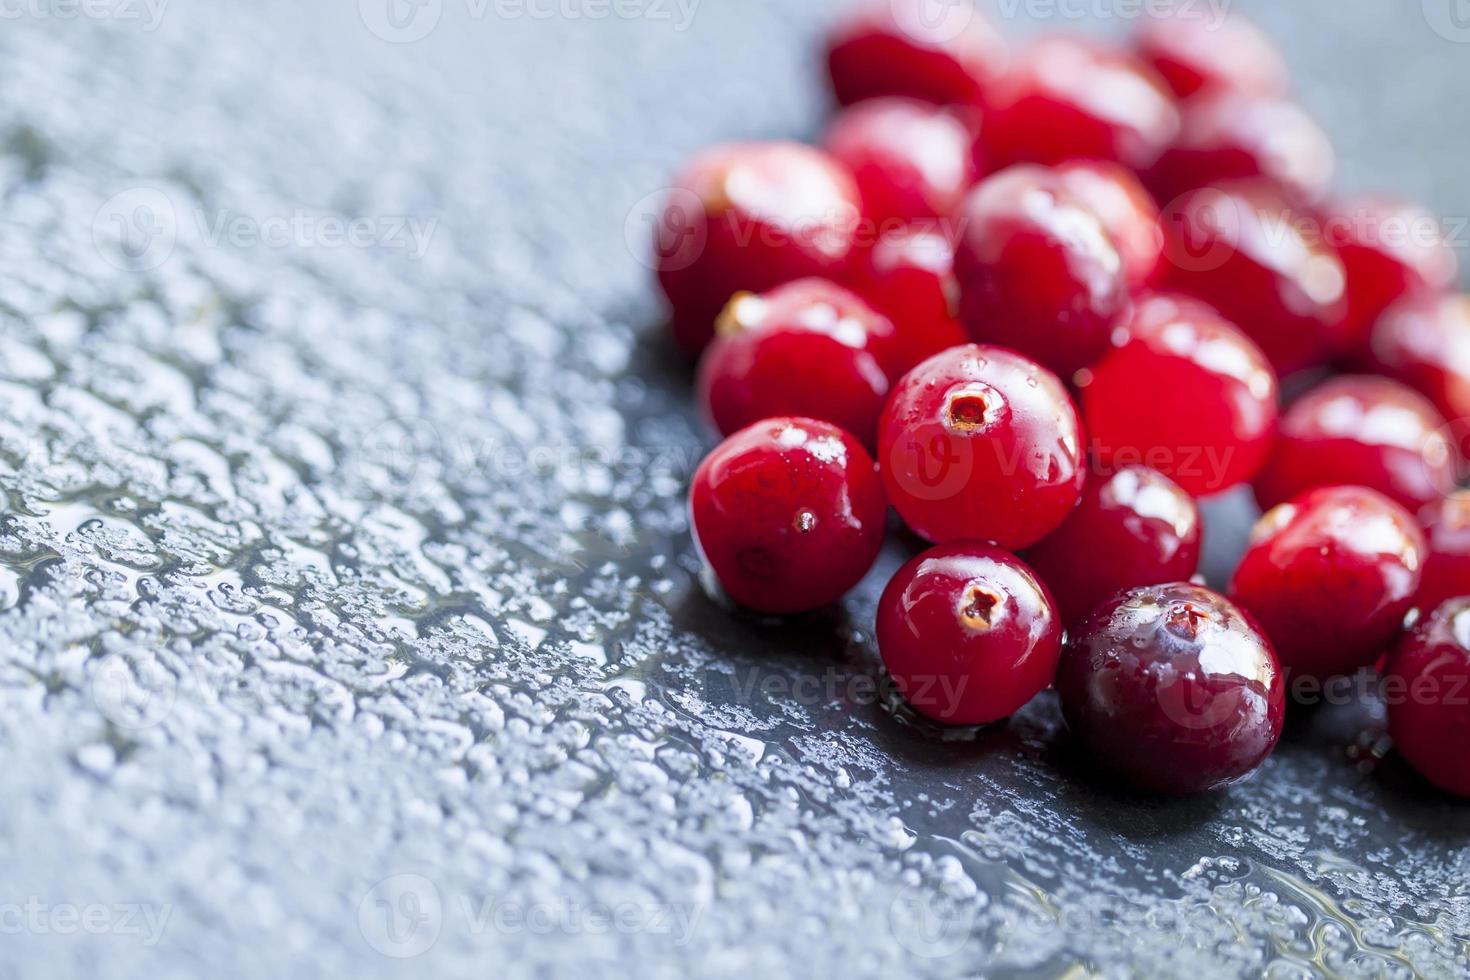 Wet cranberry  on a dark stone wet background photo